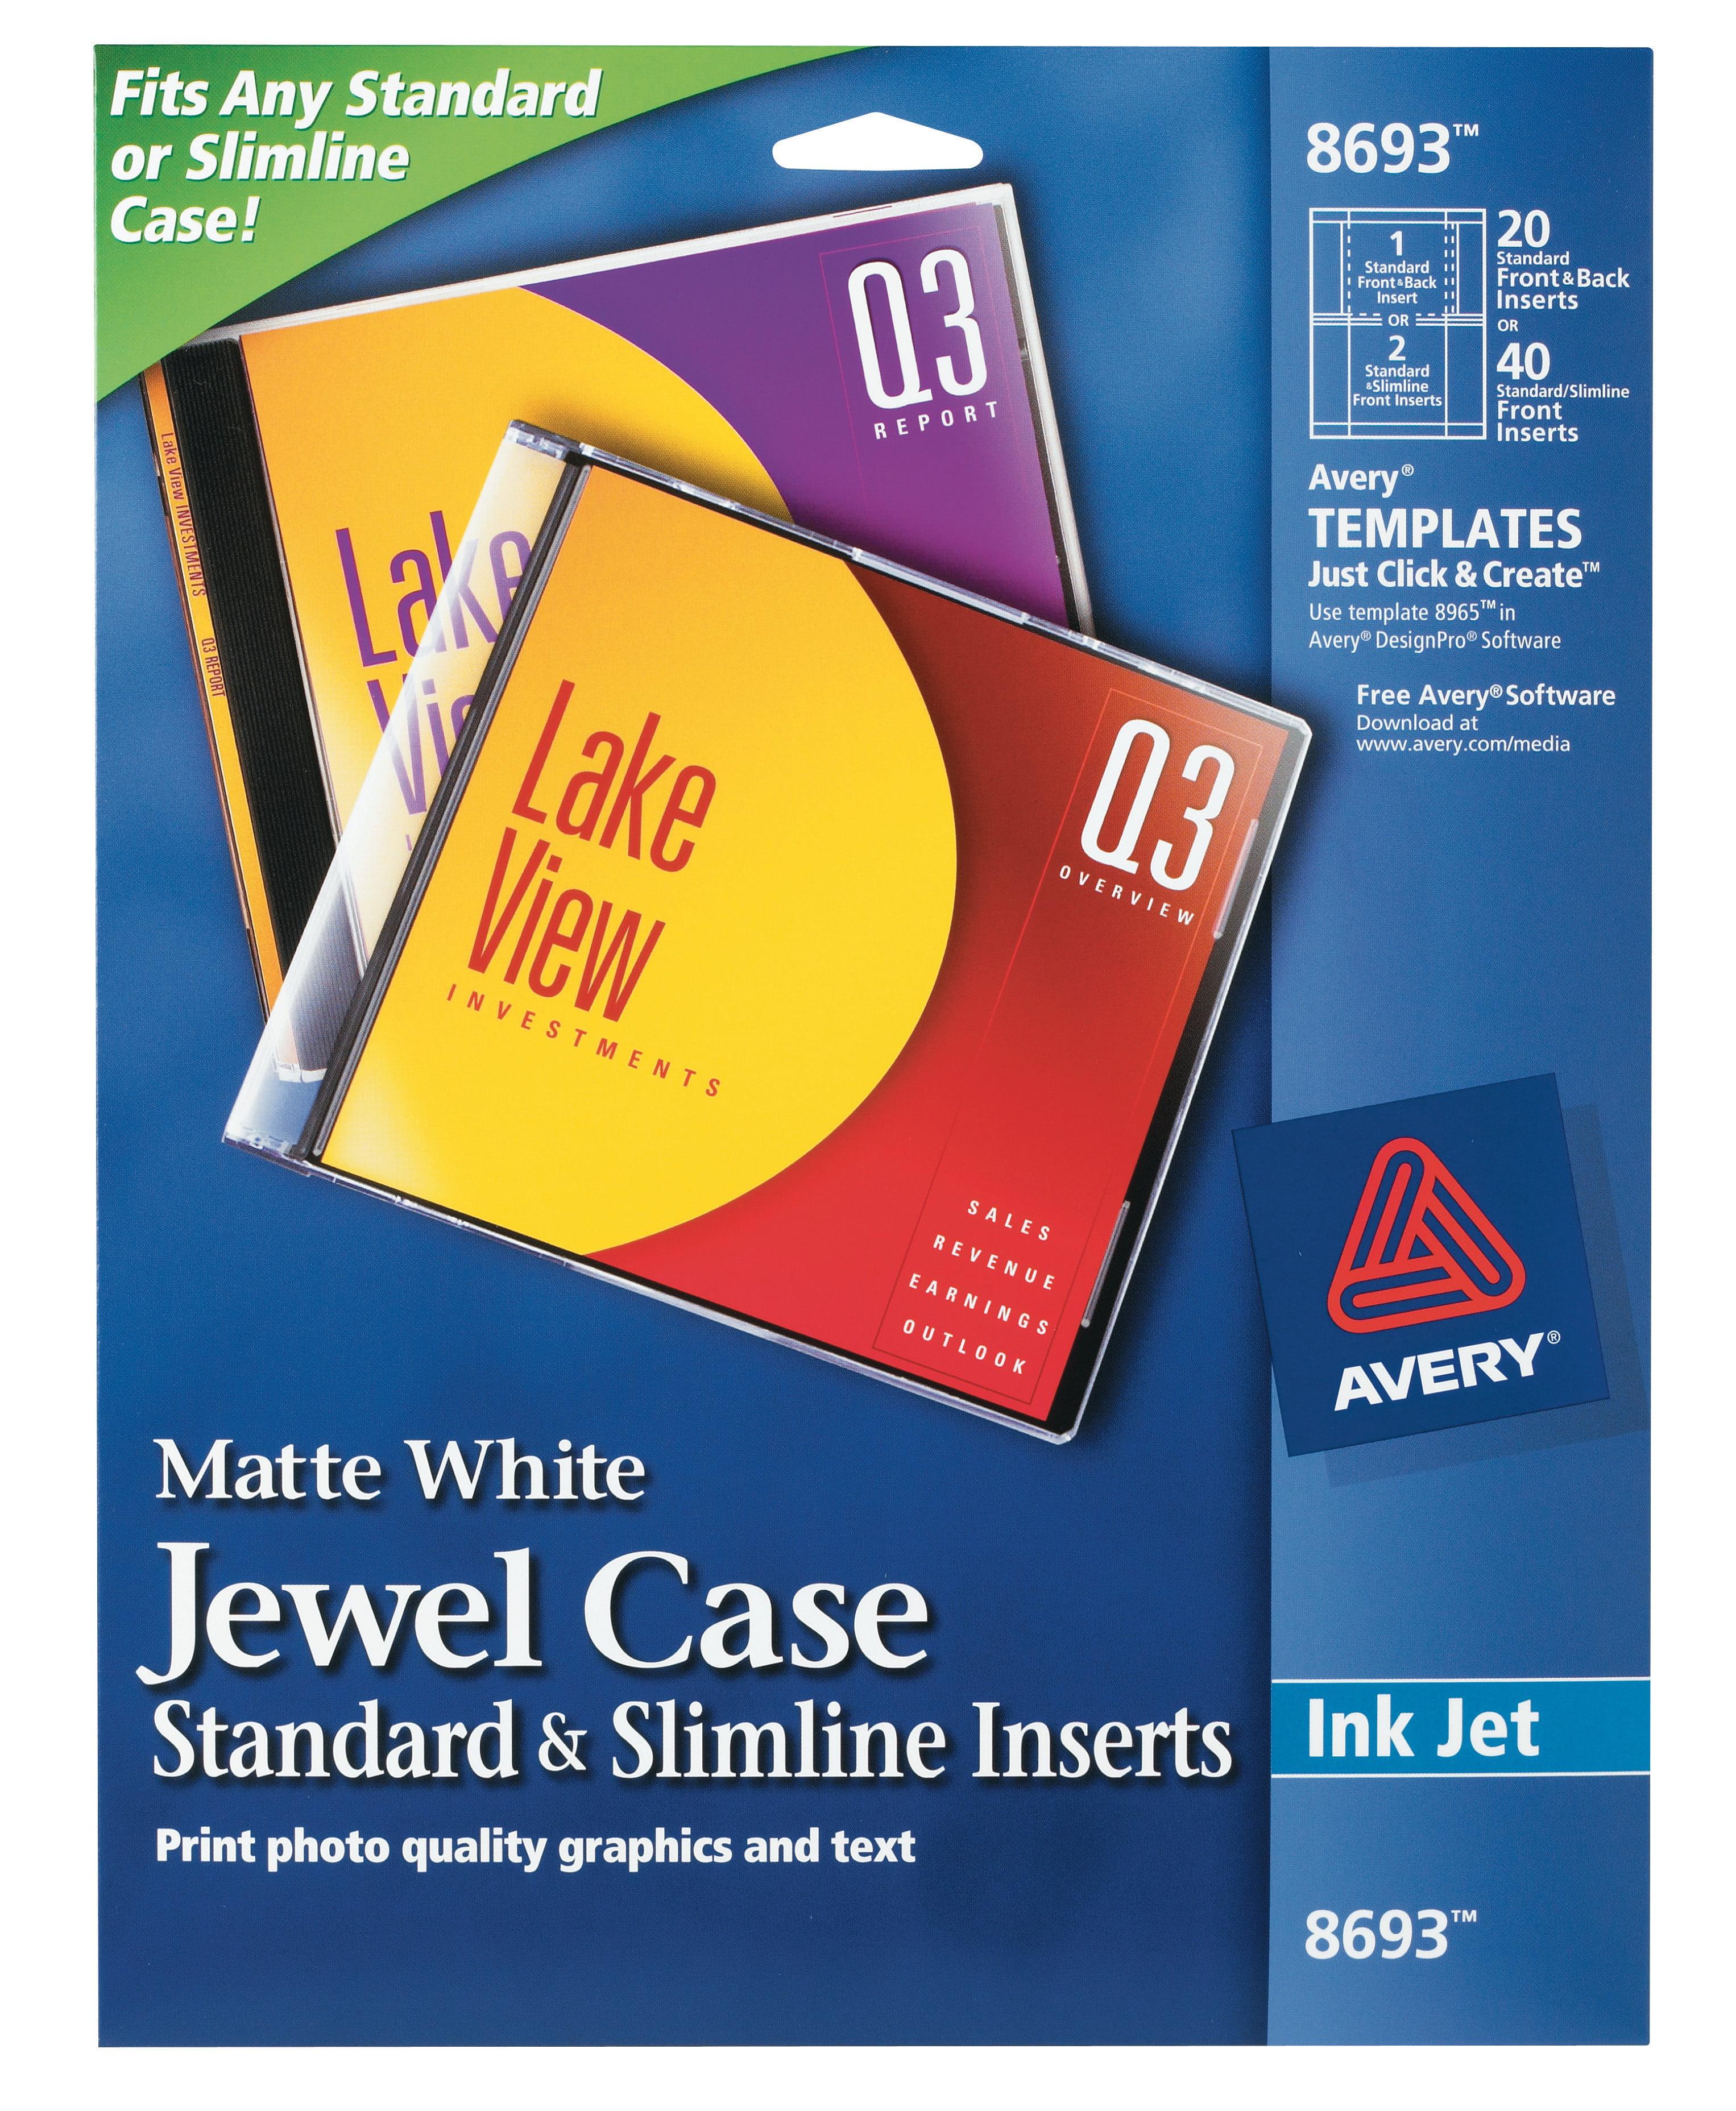 Avery Jewel Case Standard Slimline Inserts Matte 20 Inserts 8693 Walmart Com Walmart Com